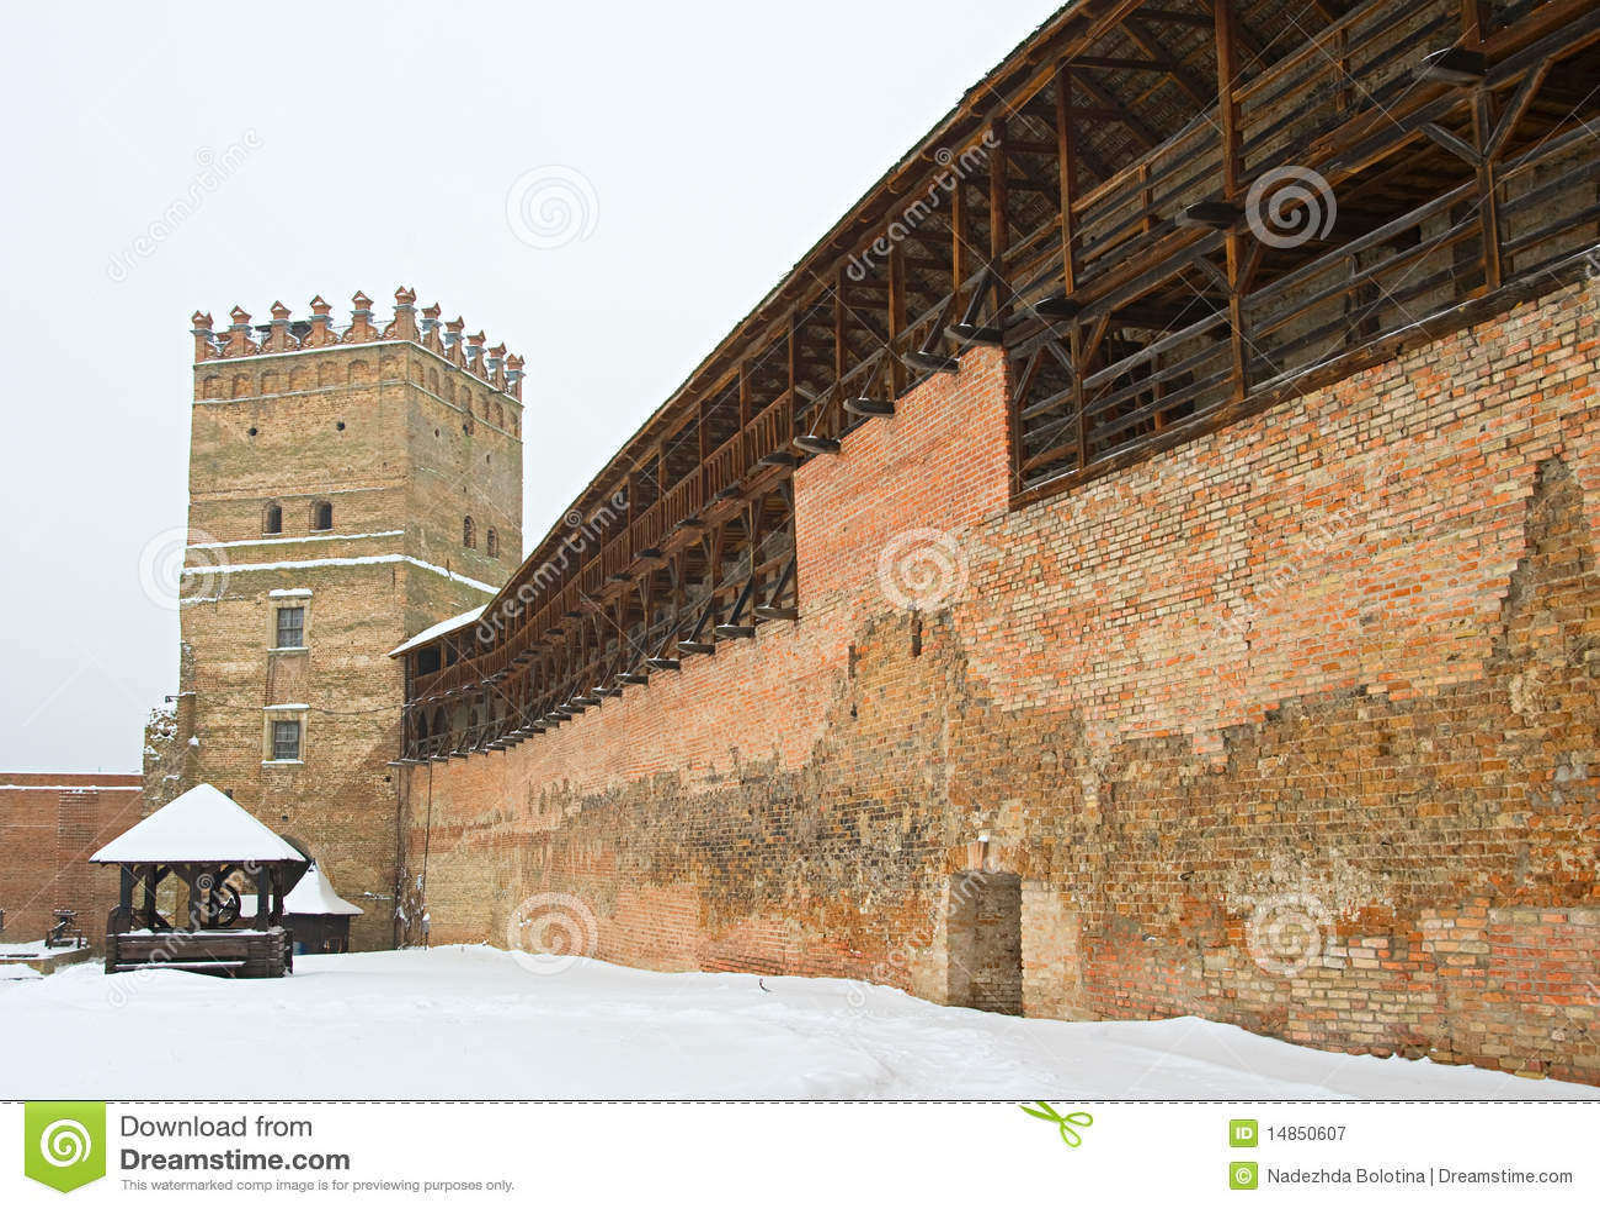 Fortress in Lutsk, Ukraine